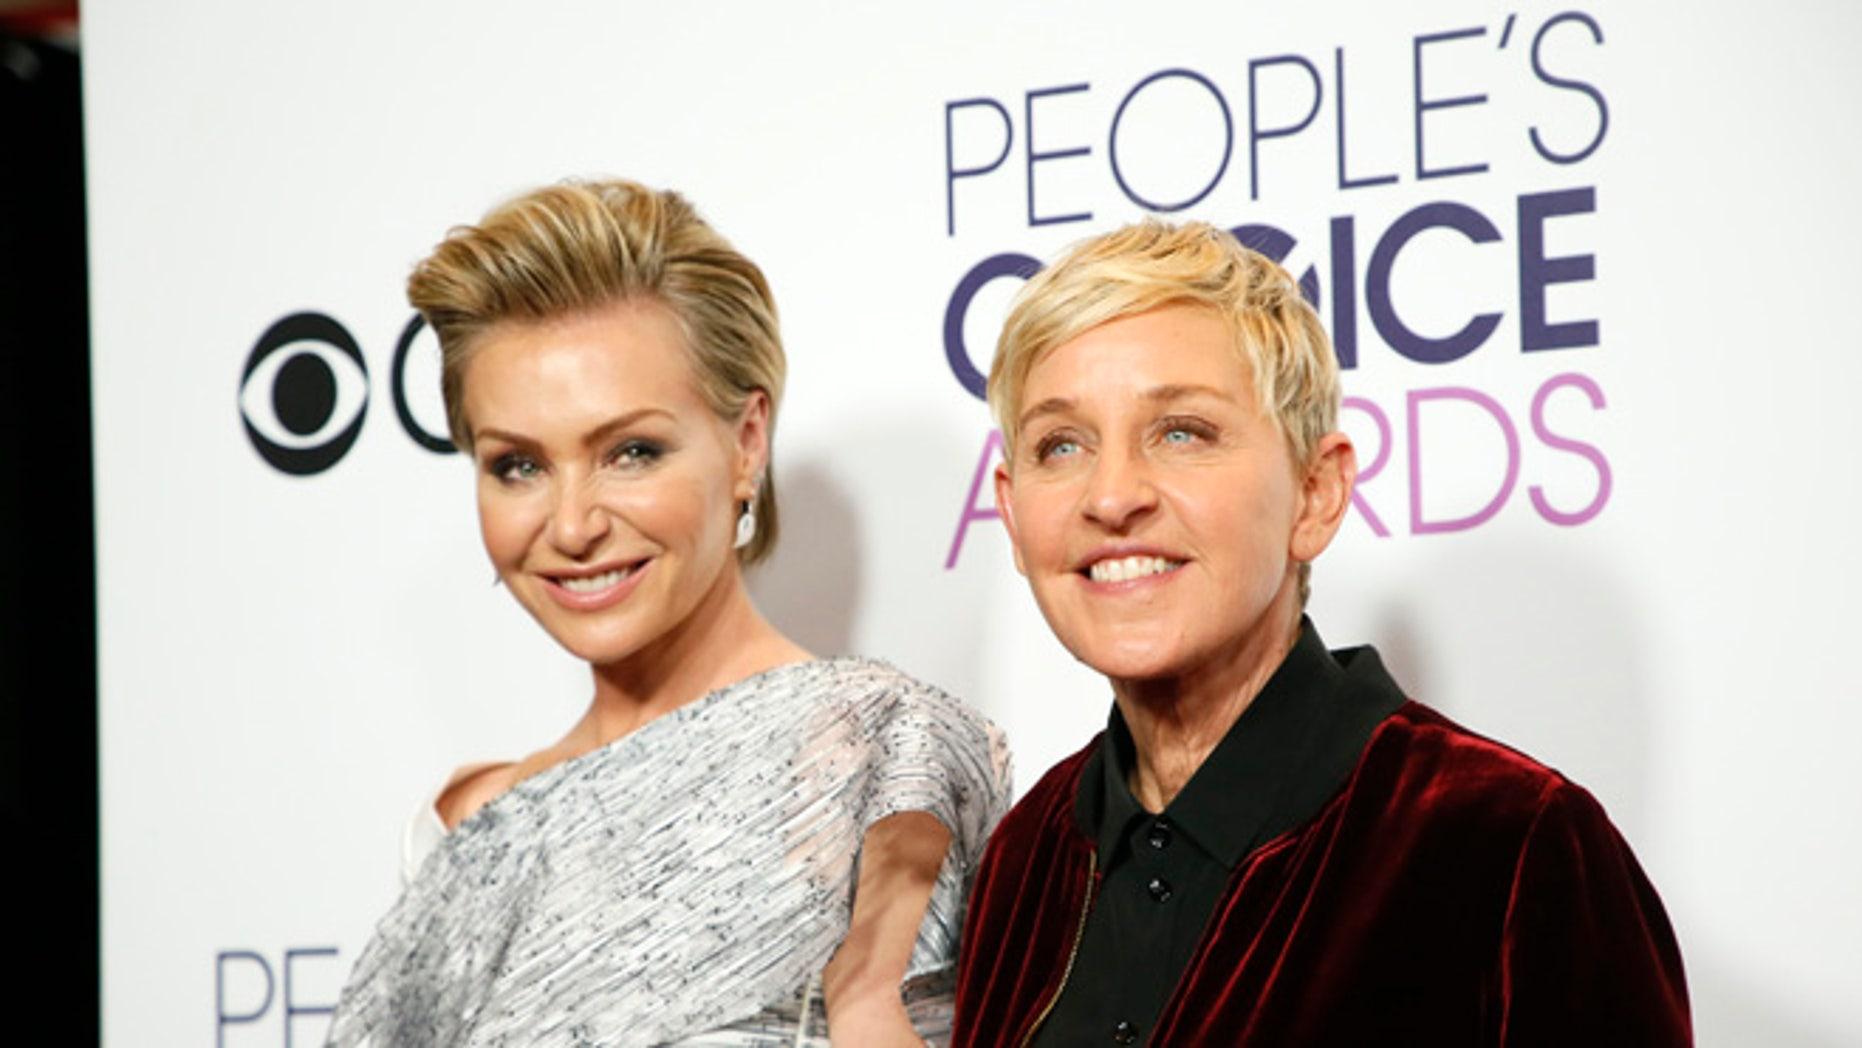 Ellen DeGeneres with wife Portia de Rossi wishes she had come out sooner